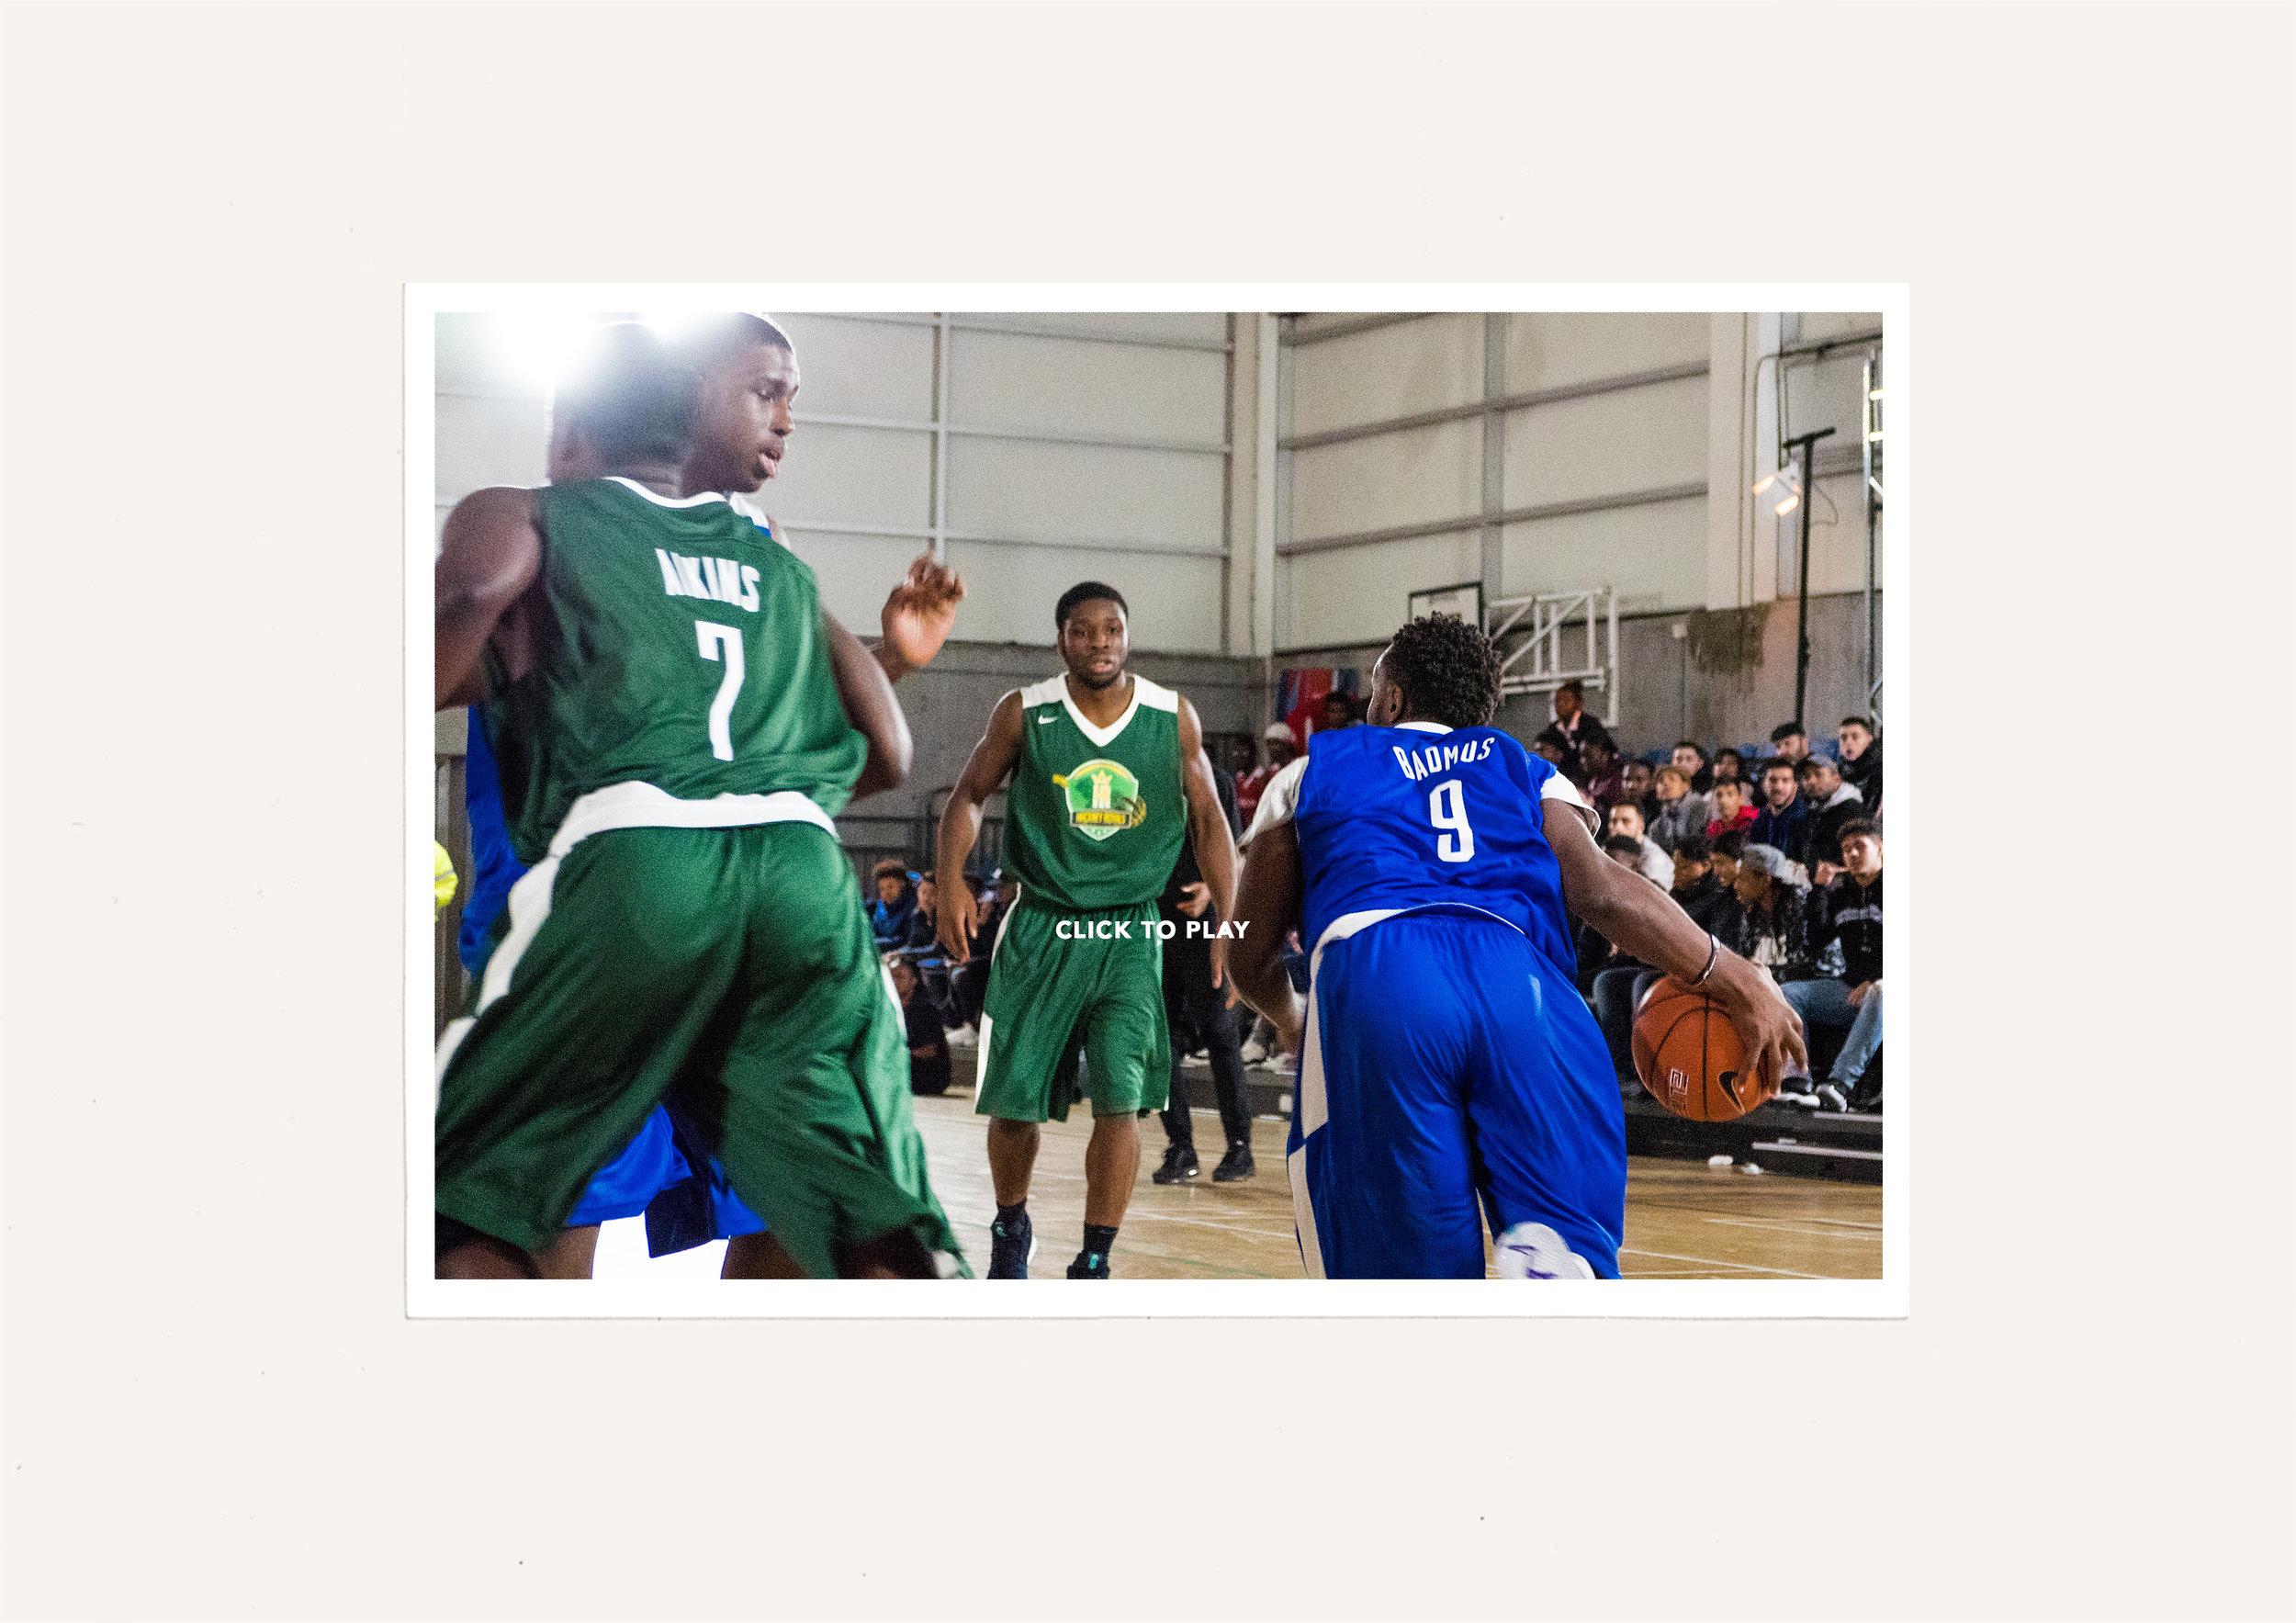 Nike_Basketball_Gallery_Image_6.jpg